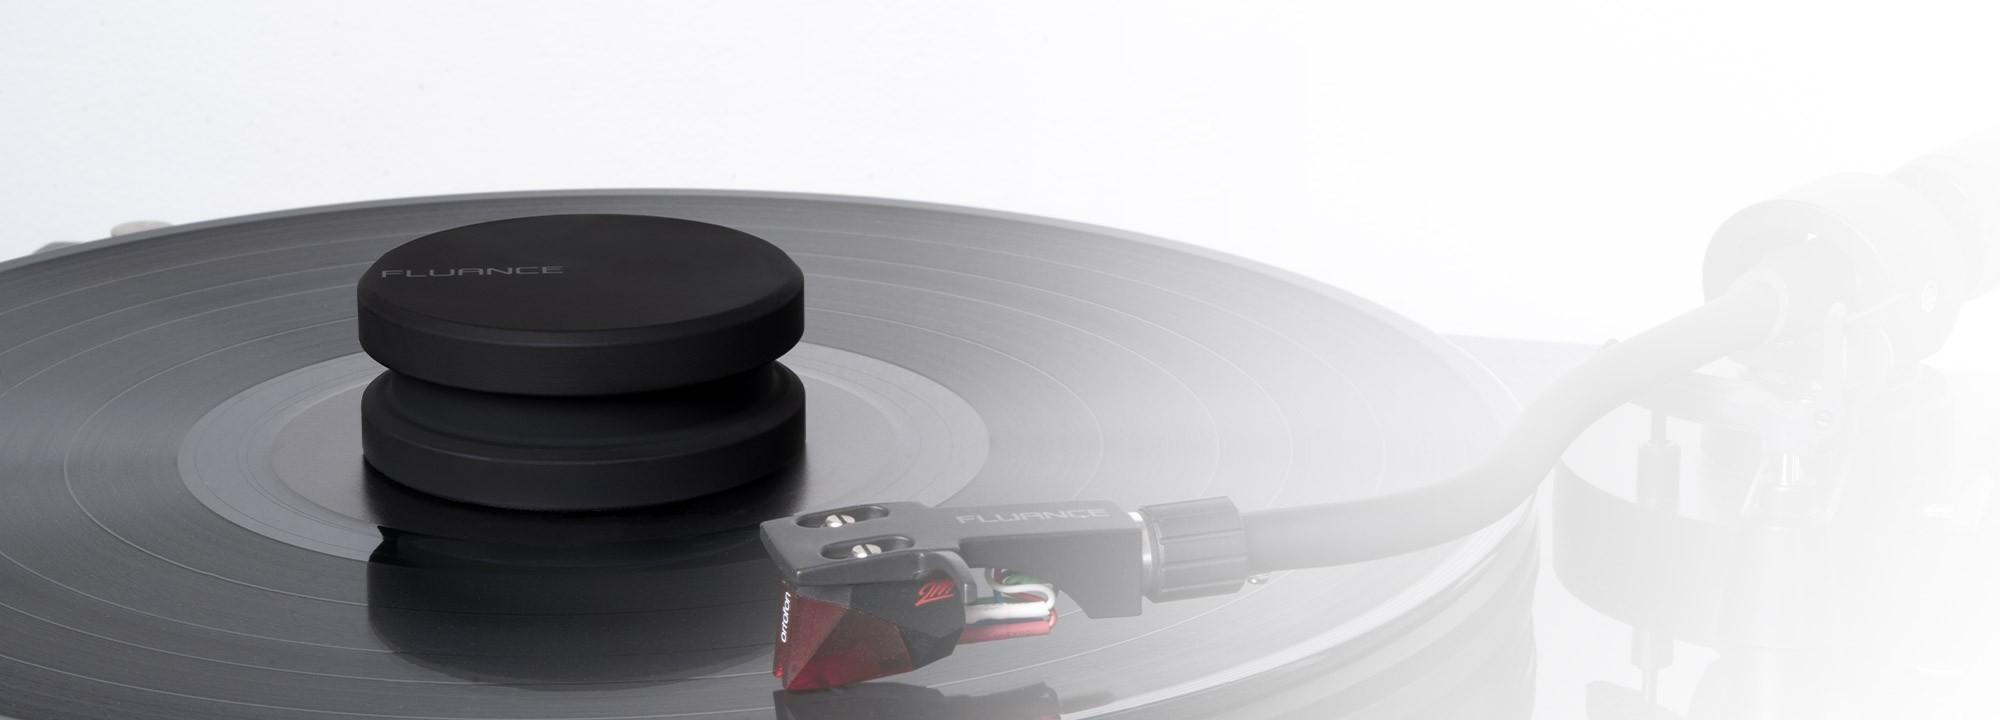 HiFi Vinyl Record Weight - Lifestyle